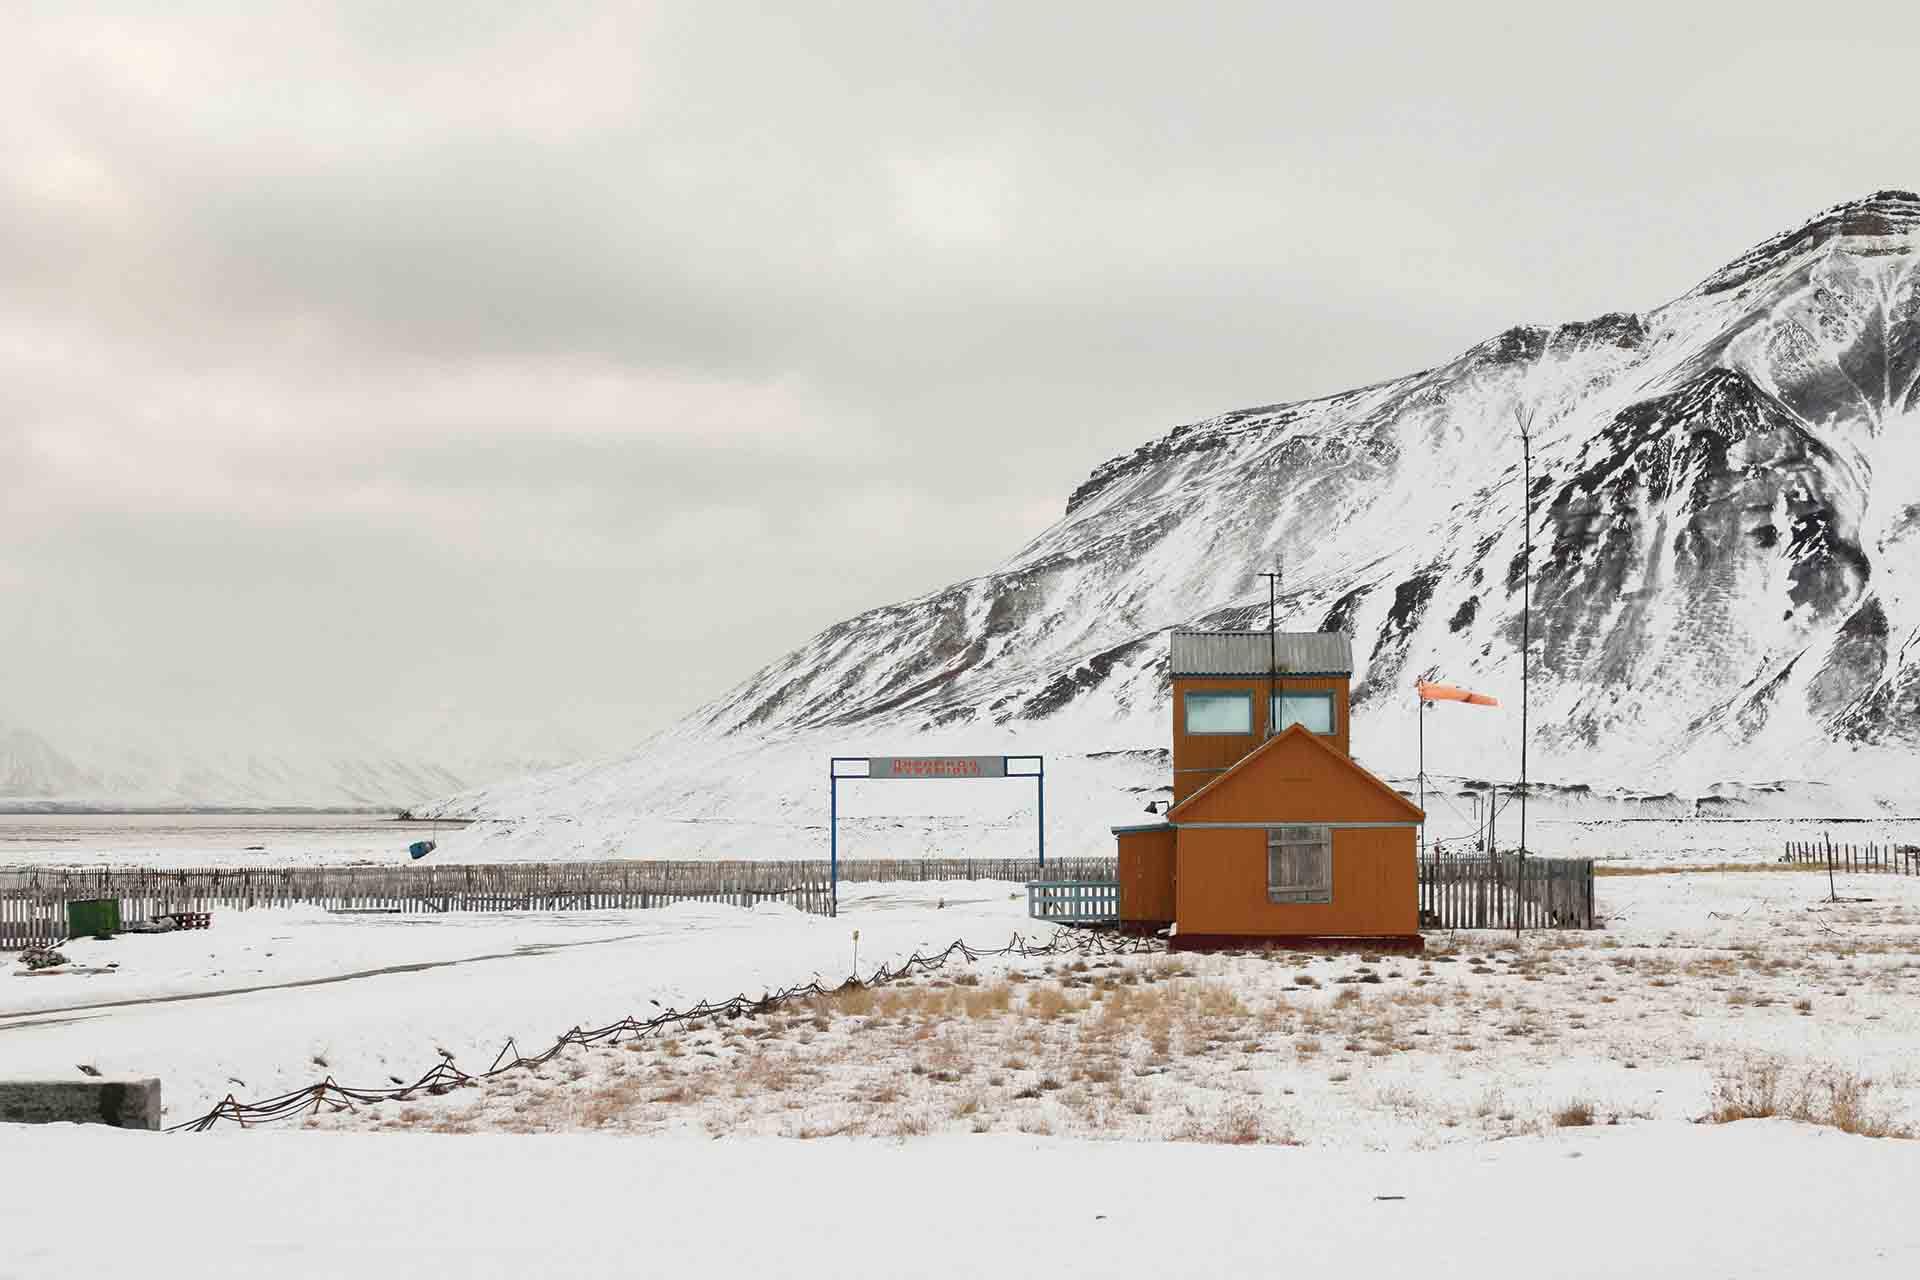 Pyramiden, Spitsbergen, Svalbard 20<br/>Impresión digital / Inject print